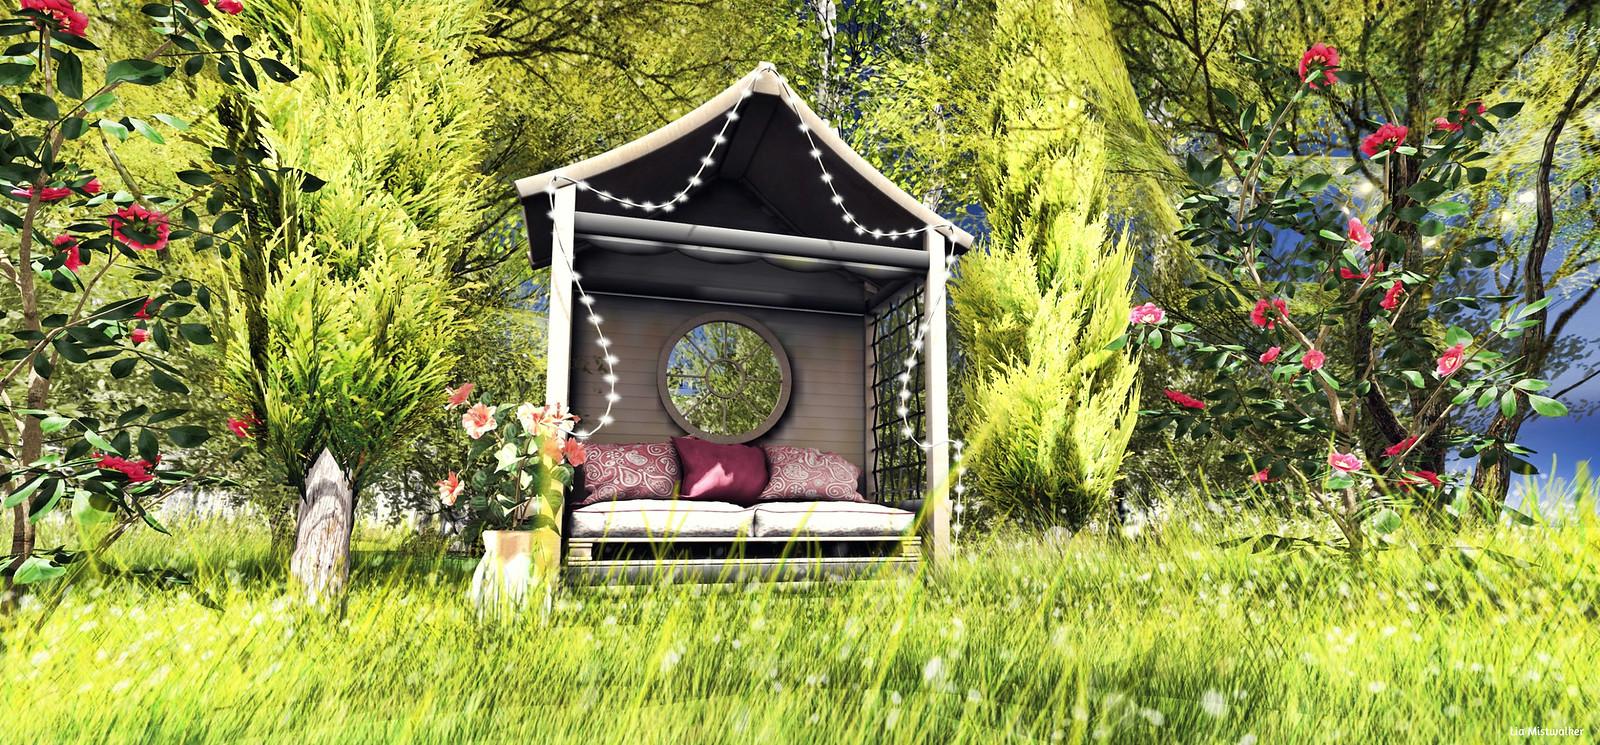 Home & Garden Therapy # 678